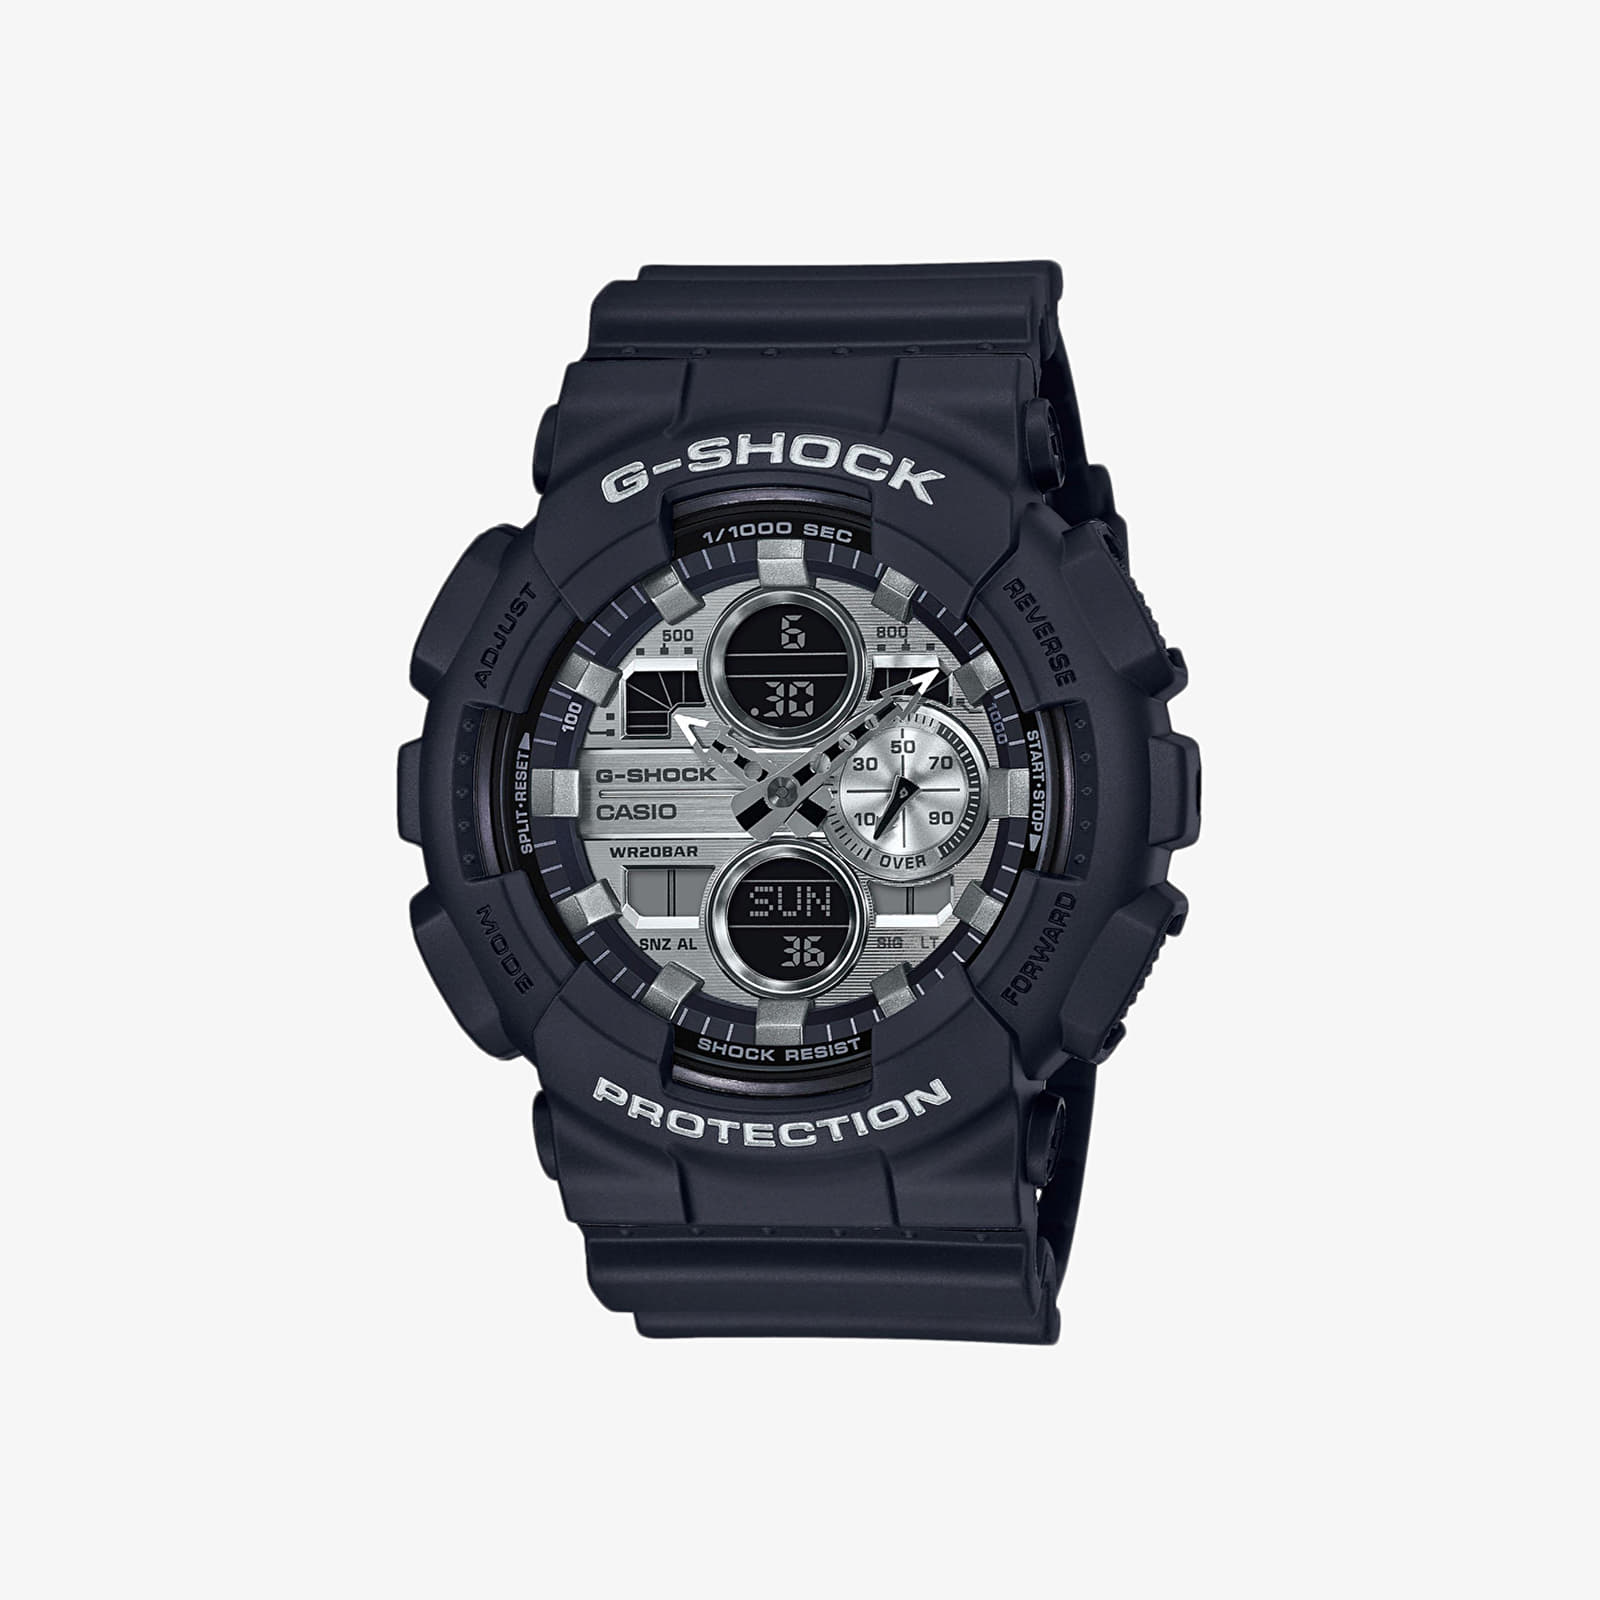 Casio G-Shock GA-140GM-1A1ER Black Universal